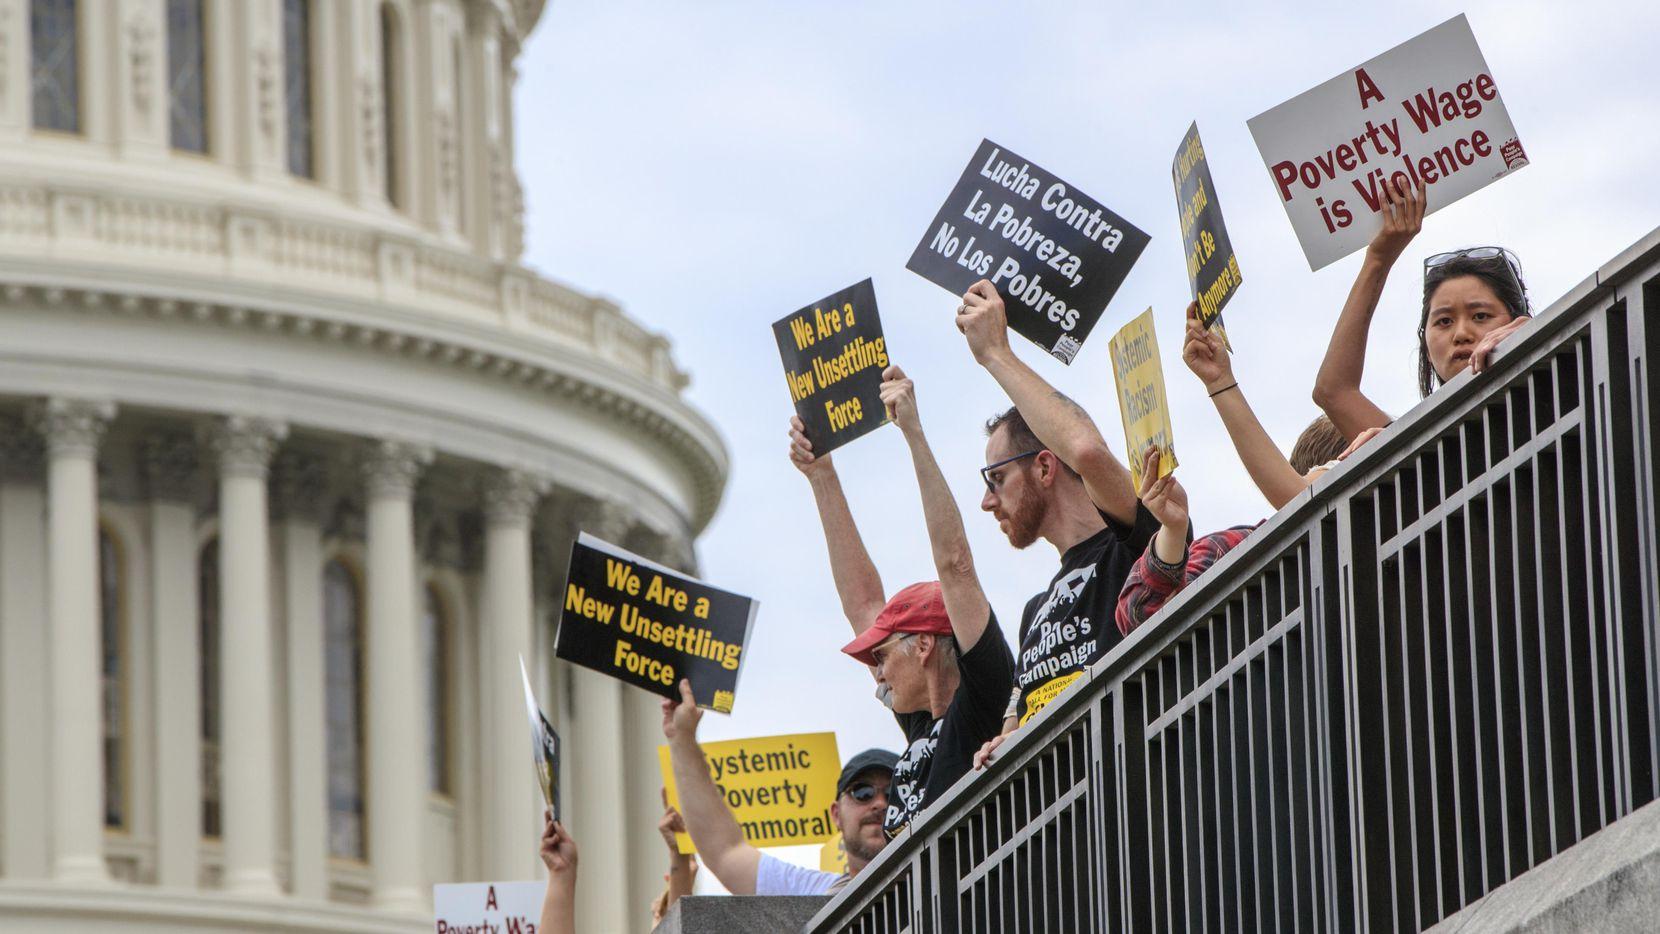 Manifestantes se congregaron frente al Capitolio en Washington D.C., en protesta a políticas migraorias que separan familias.(AP)